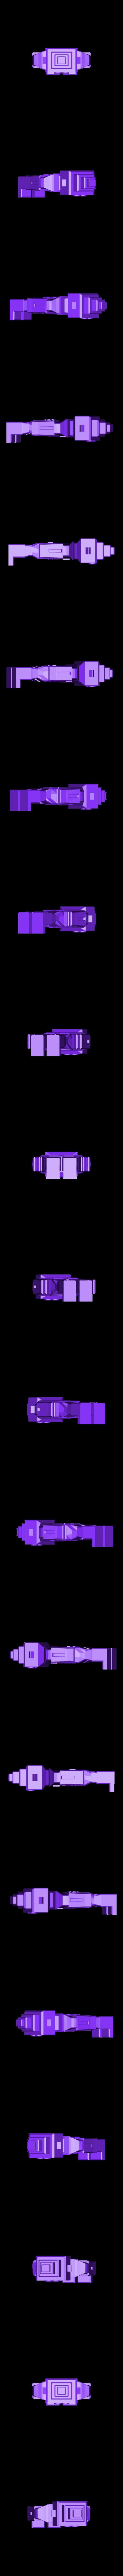 3d-fabric-jean-pierre_fat_the_robot.stl Download OBJ file Fat Fat the robot • 3D printable template, 3d-fabric-jean-pierre